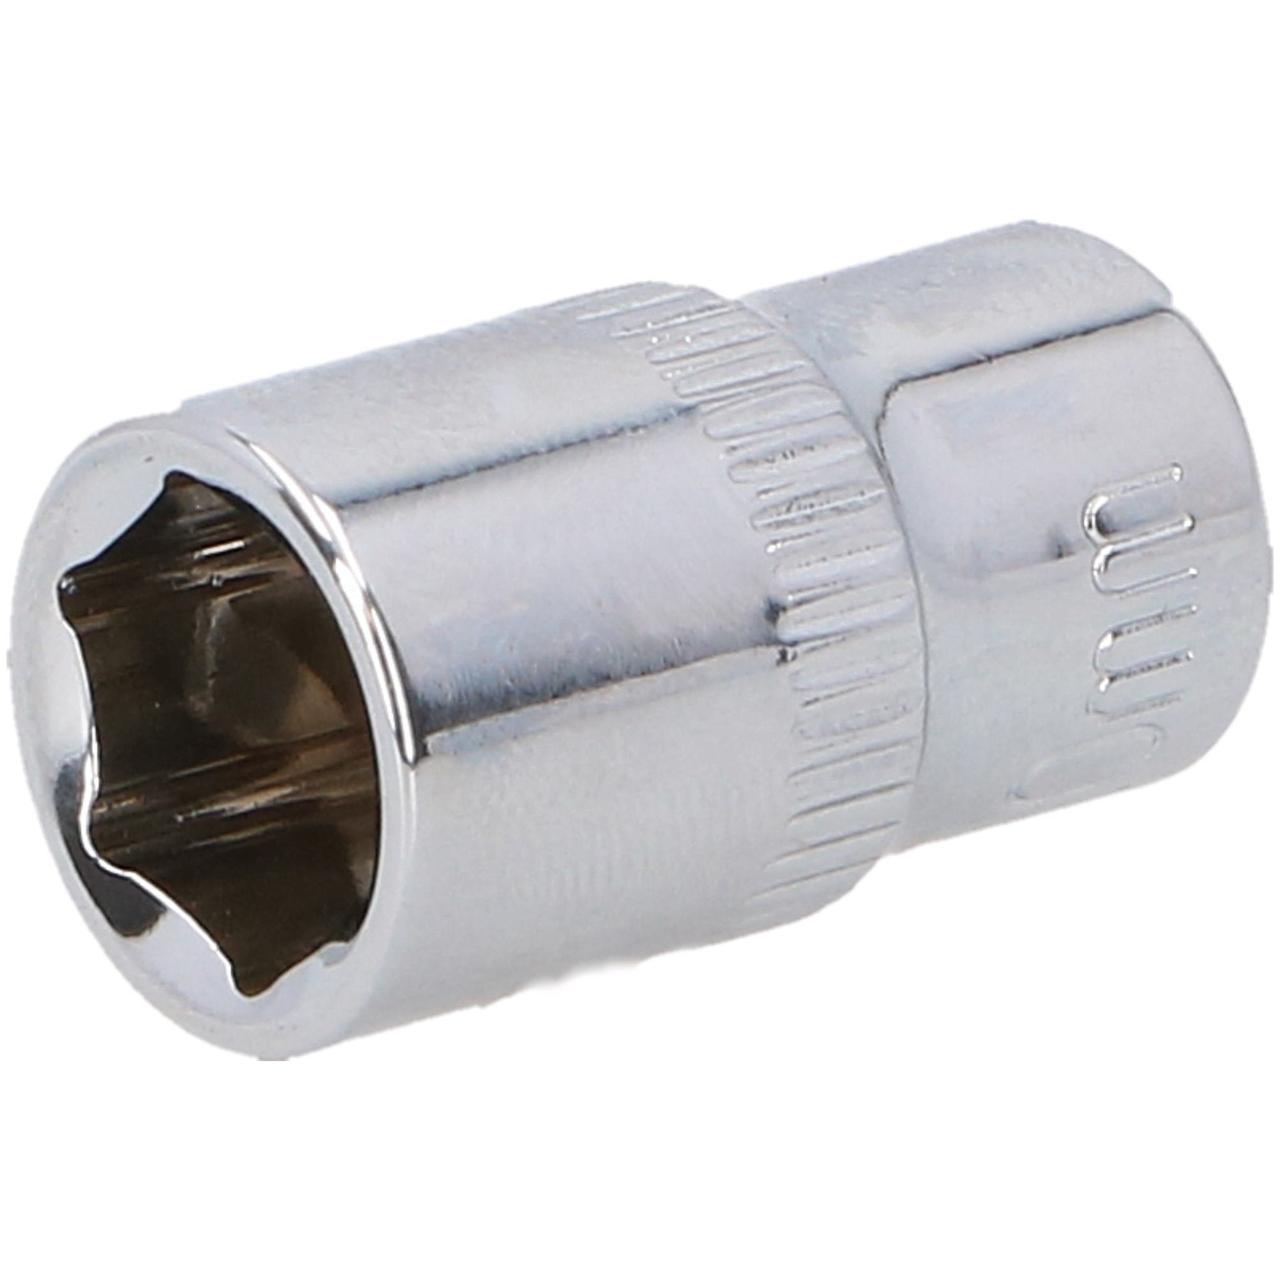 "Головка торцеві 1/4"" 10 мм FASTER TOOLS"